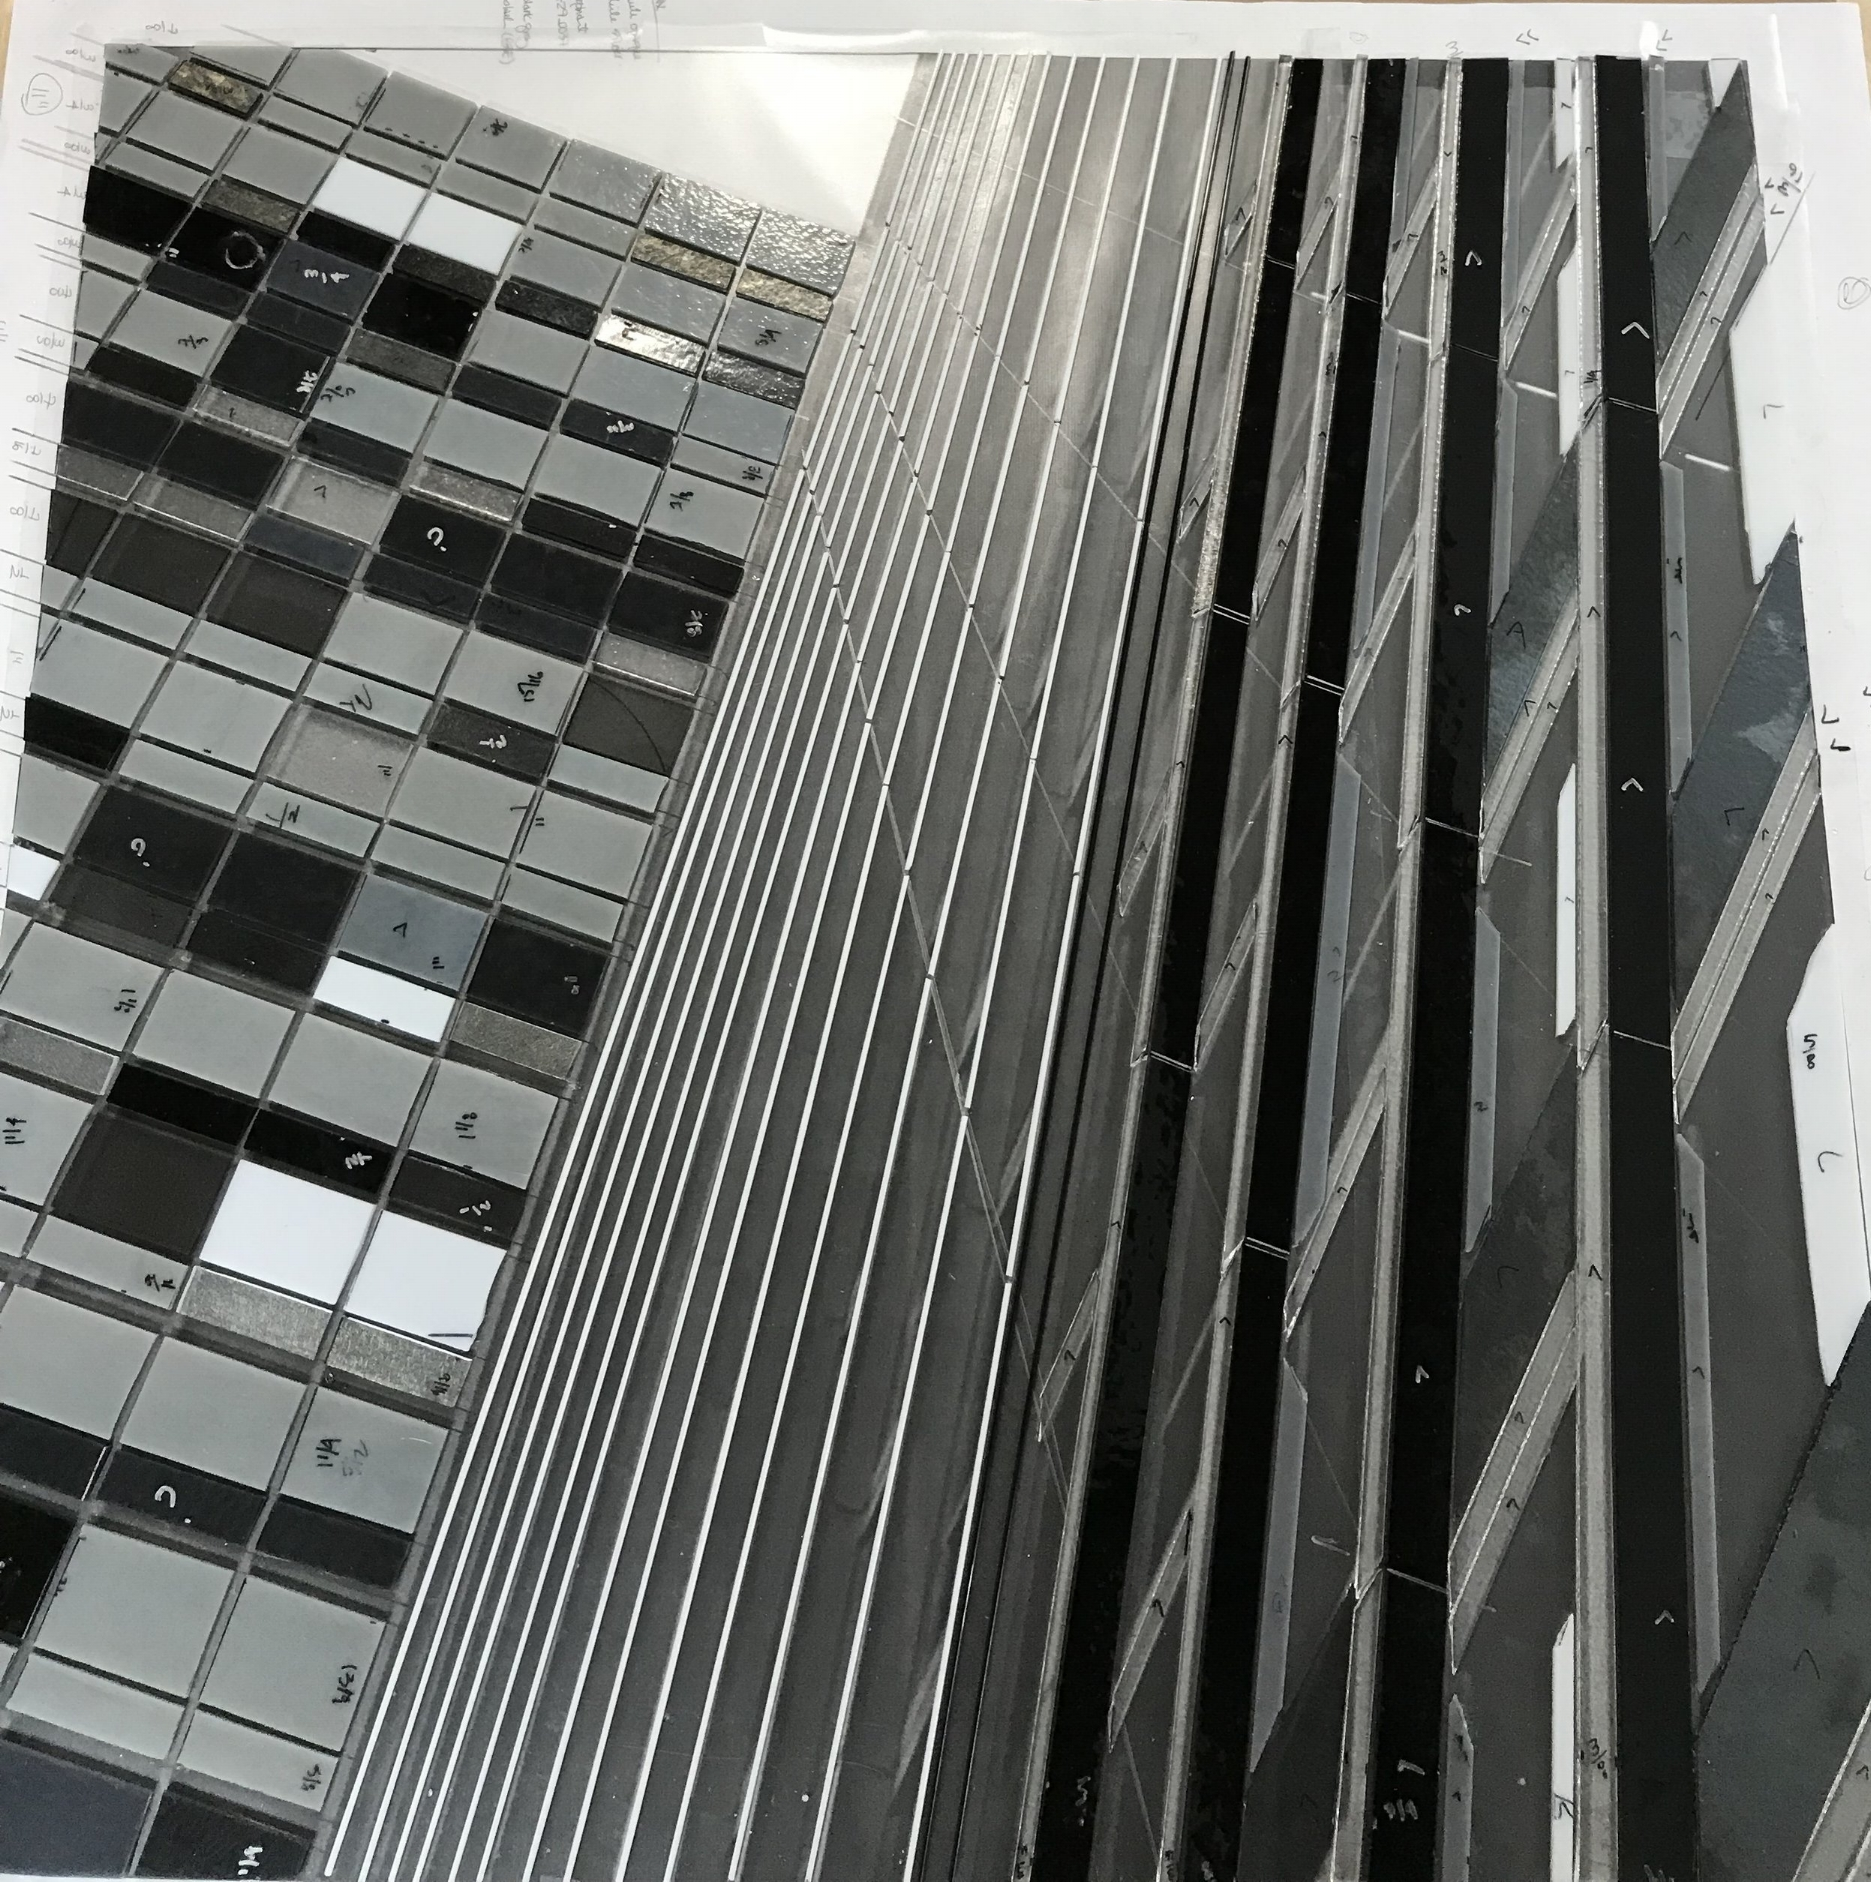 Reflect 1.37a cityview WIP | cutting glass Heather Hancock 2018